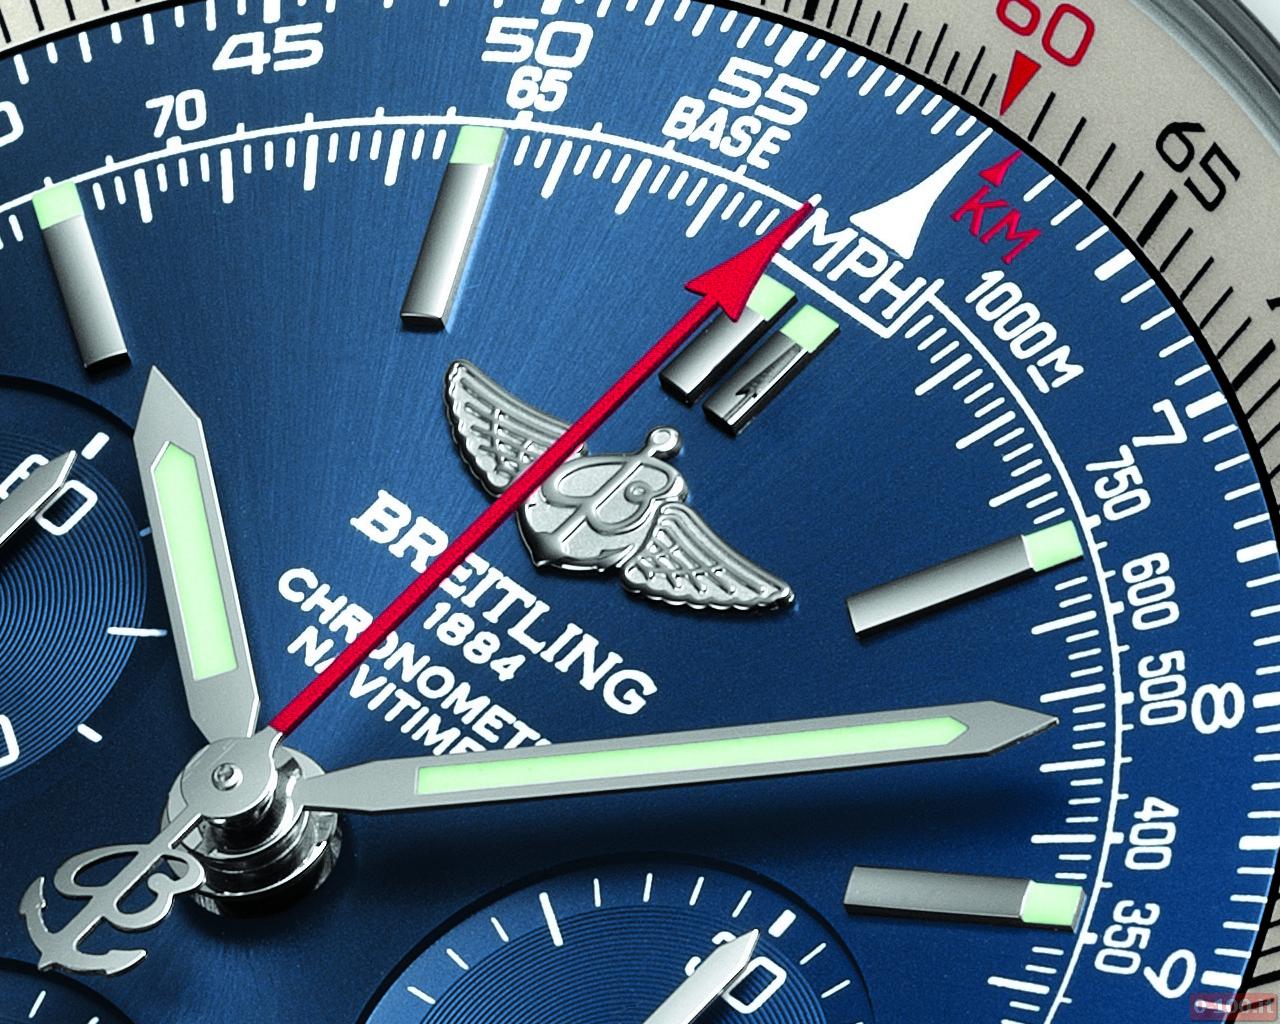 breitling-navitimer-blue-sky-limited-edition-60-anniversario_0-100_2